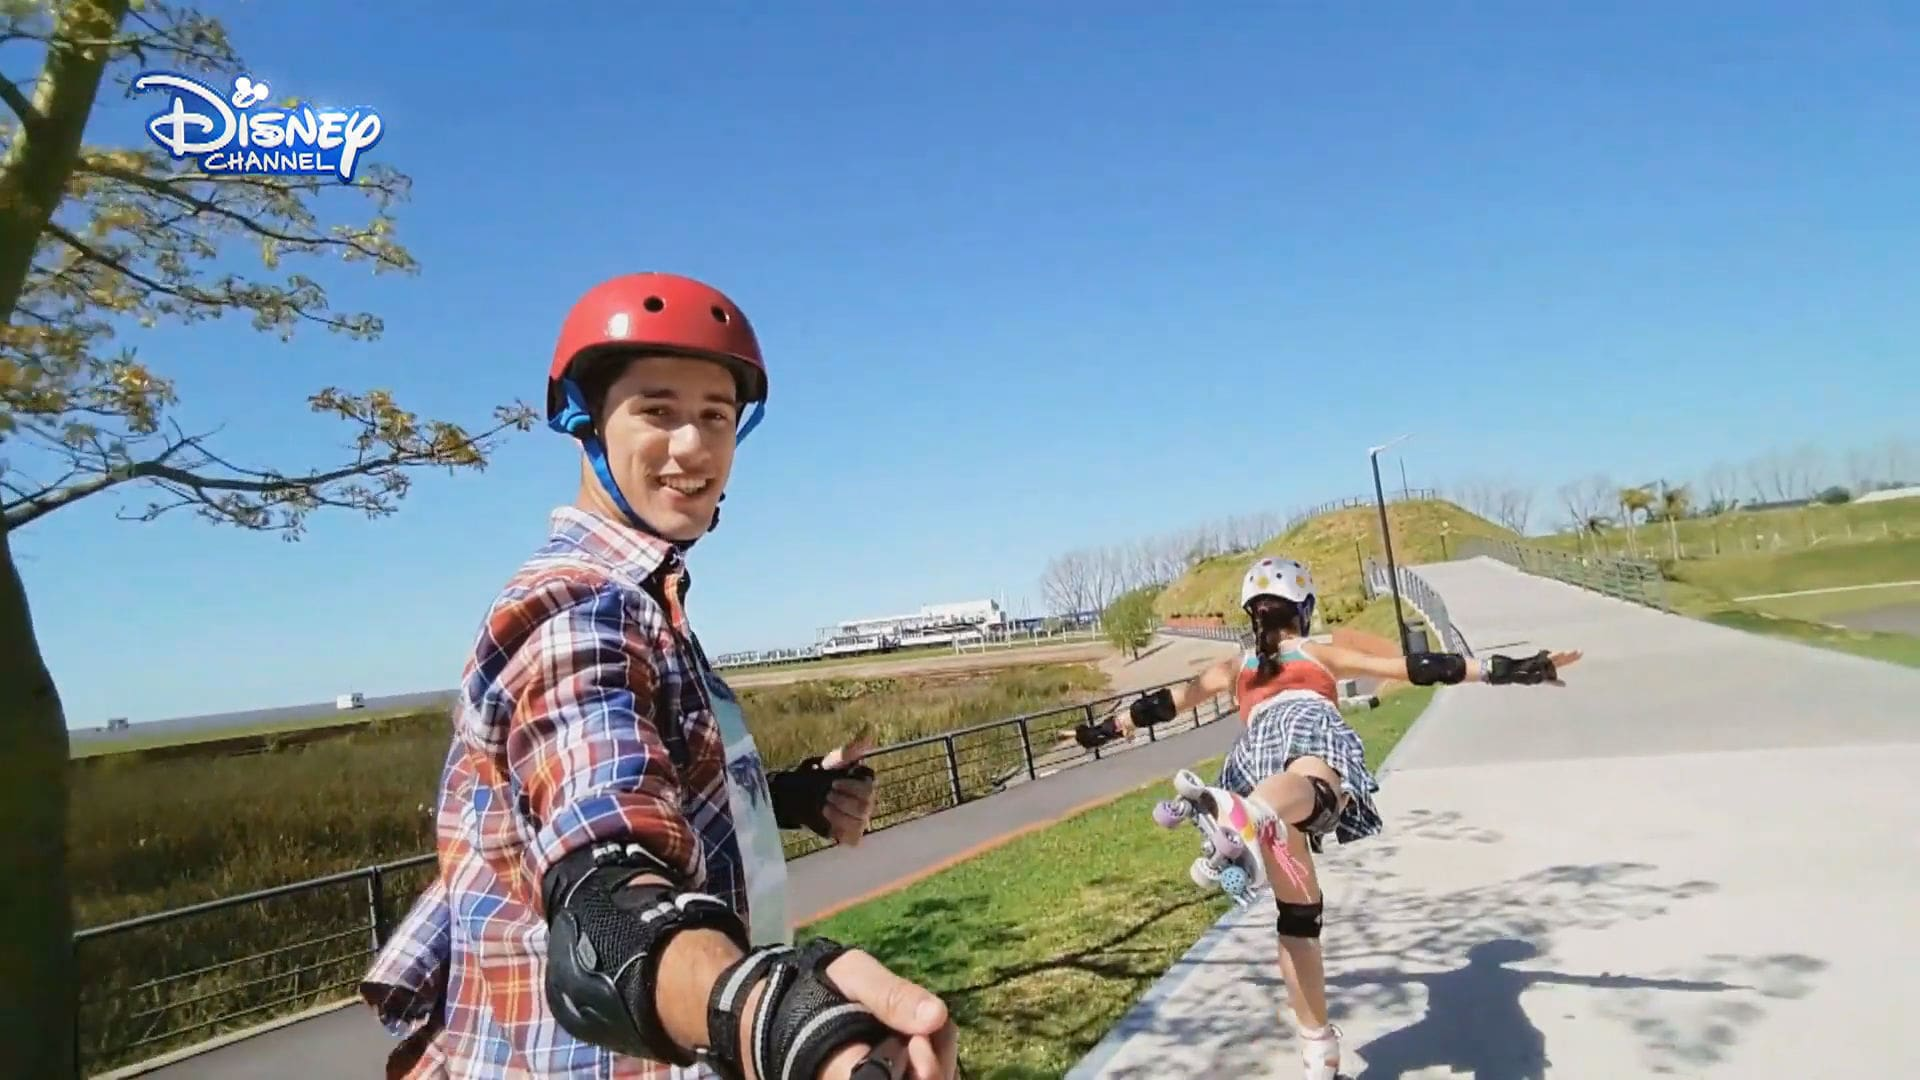 Tutorial Skate - Hoy Se Patina 4